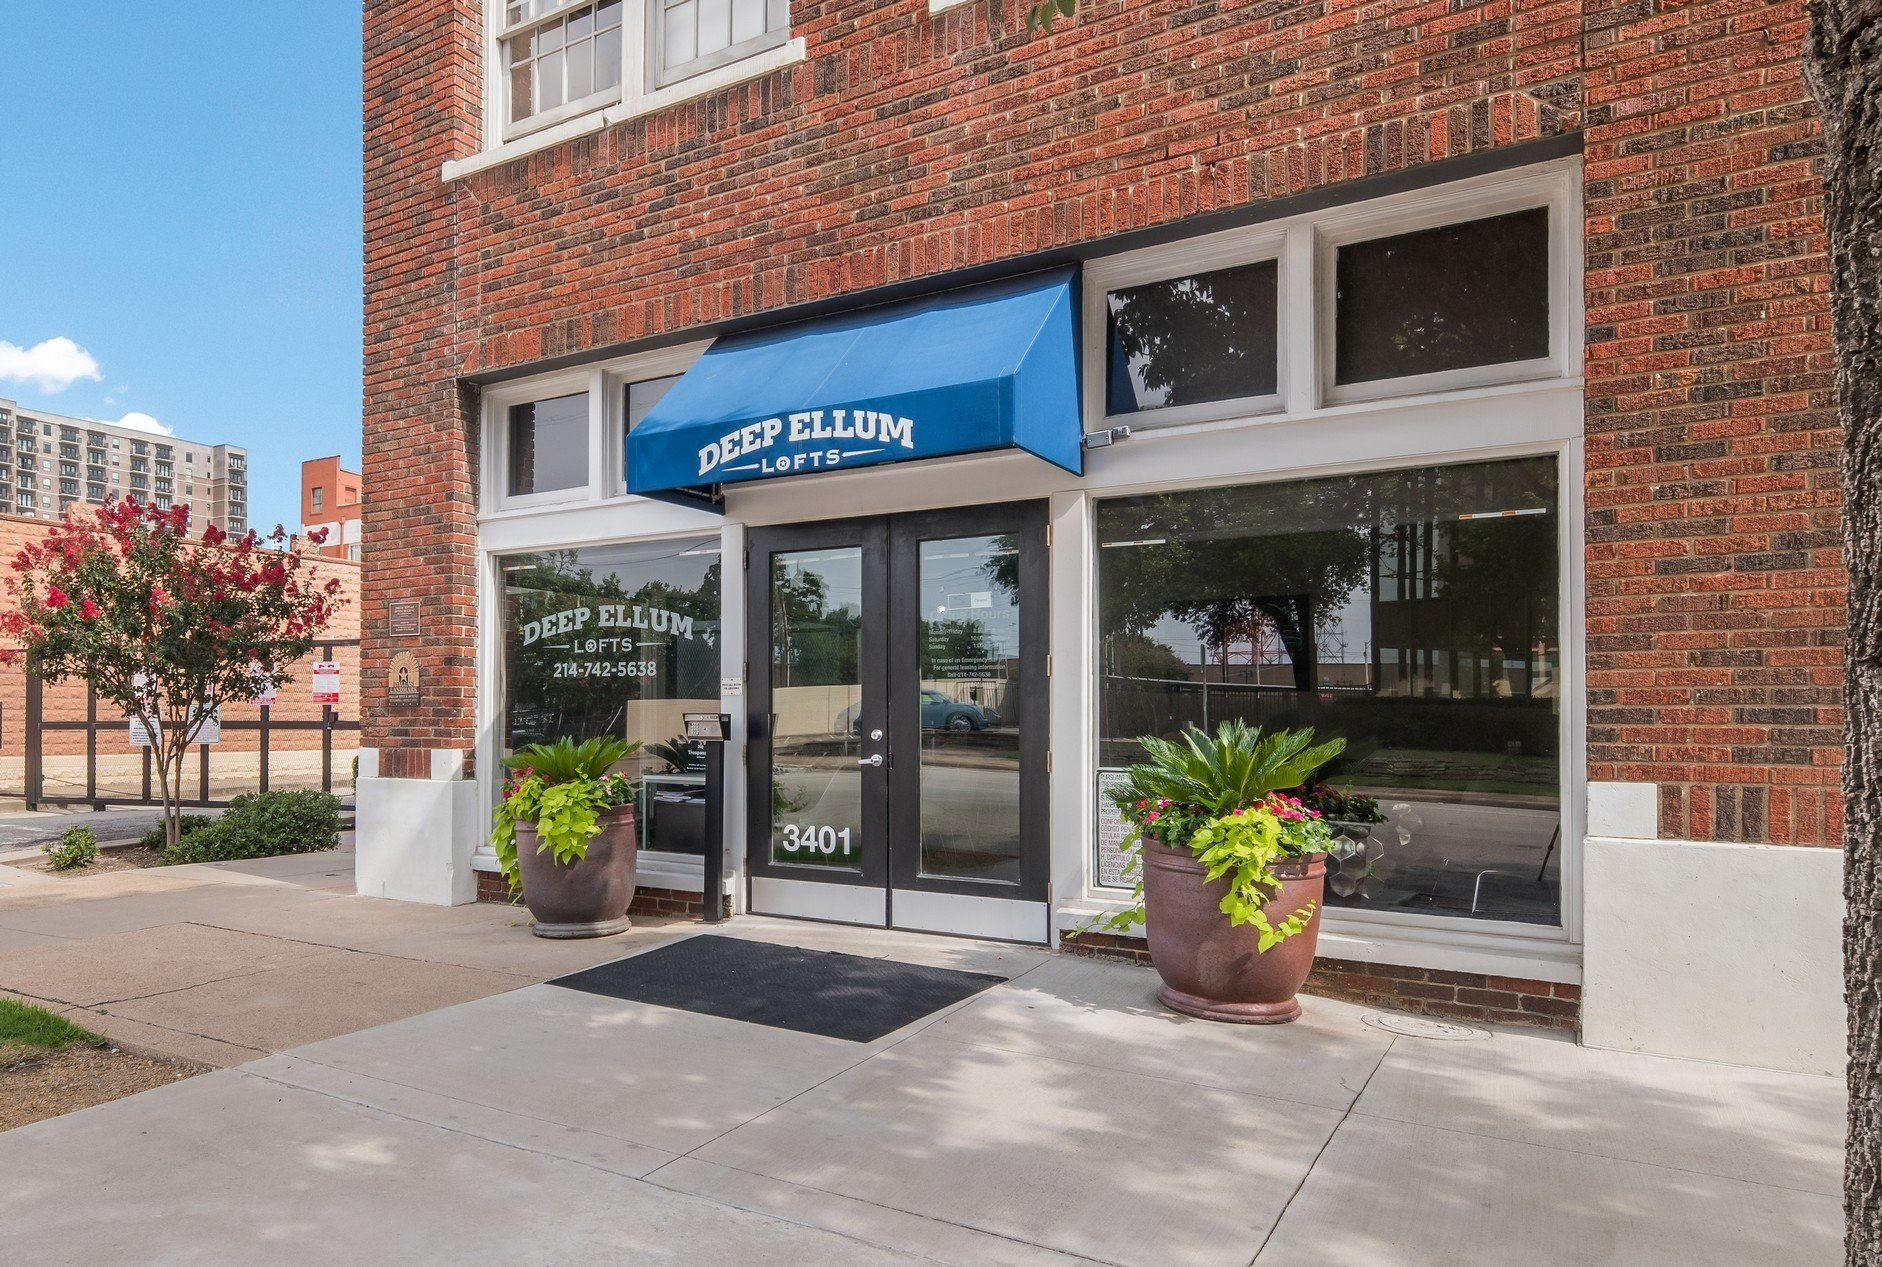 Leasing Office Exterior at The Murray Lofts - Deep Ellum Lofts, Dallas, Texas, TX